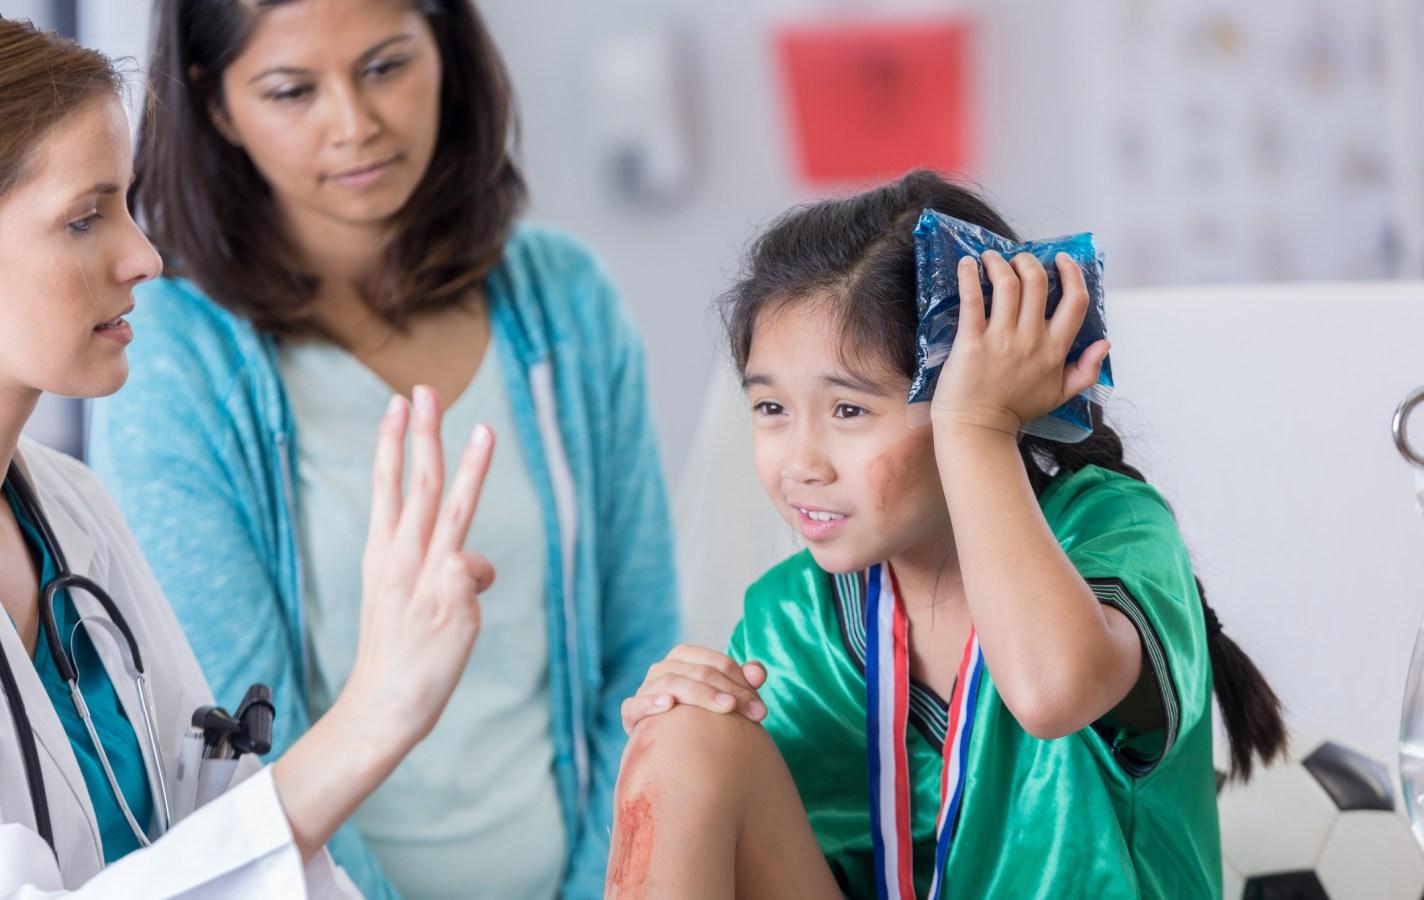 ER doctor examines dazed injured soccer player